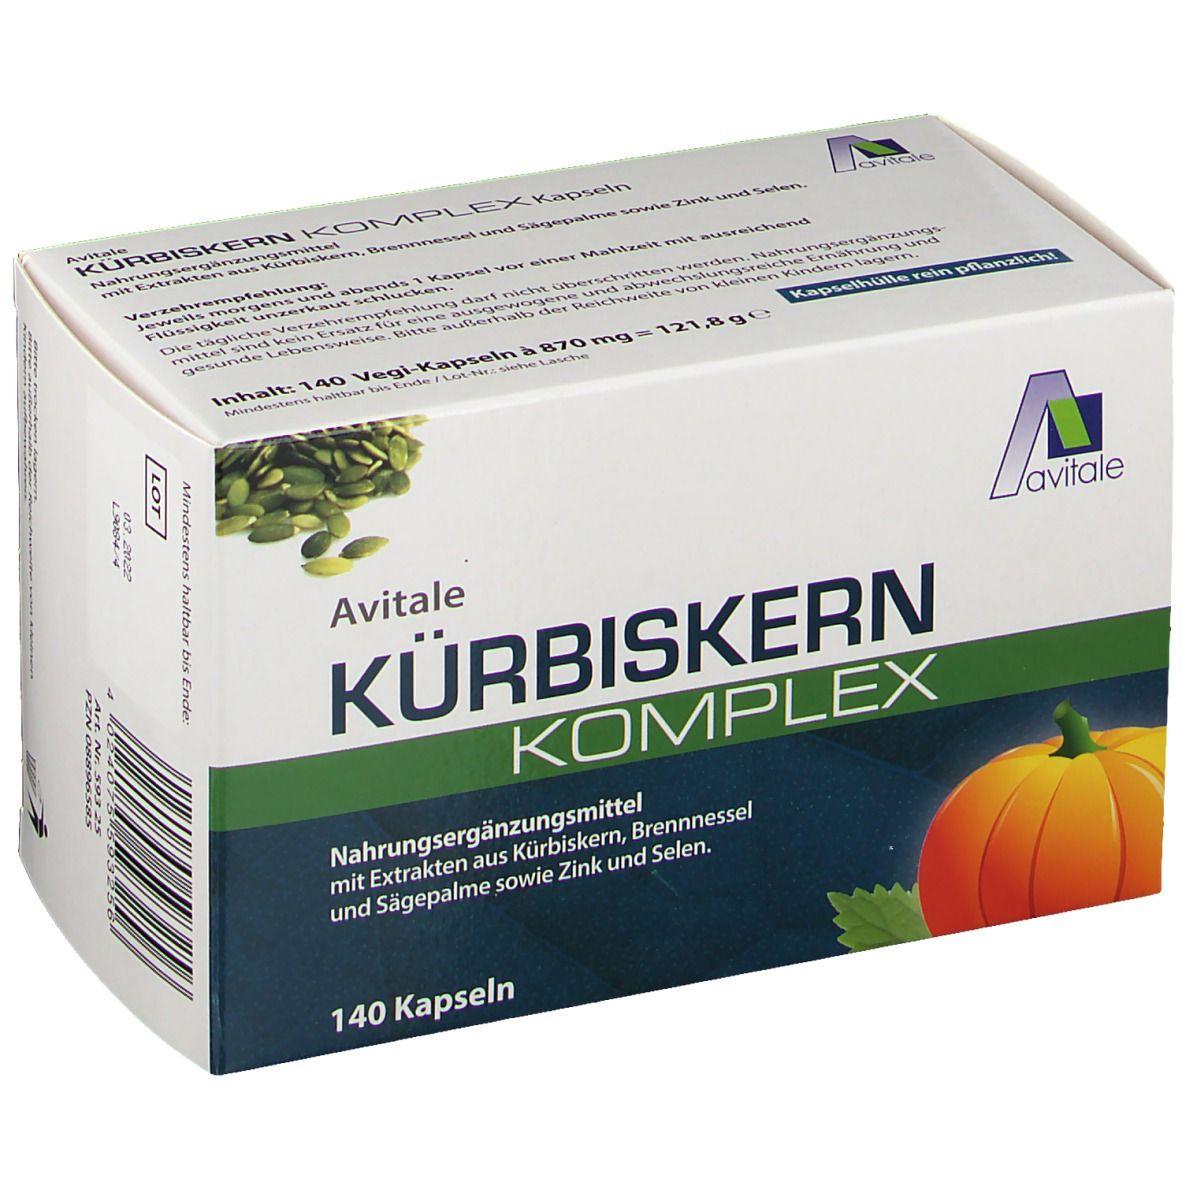 Avitale Kürbiskern Komplex